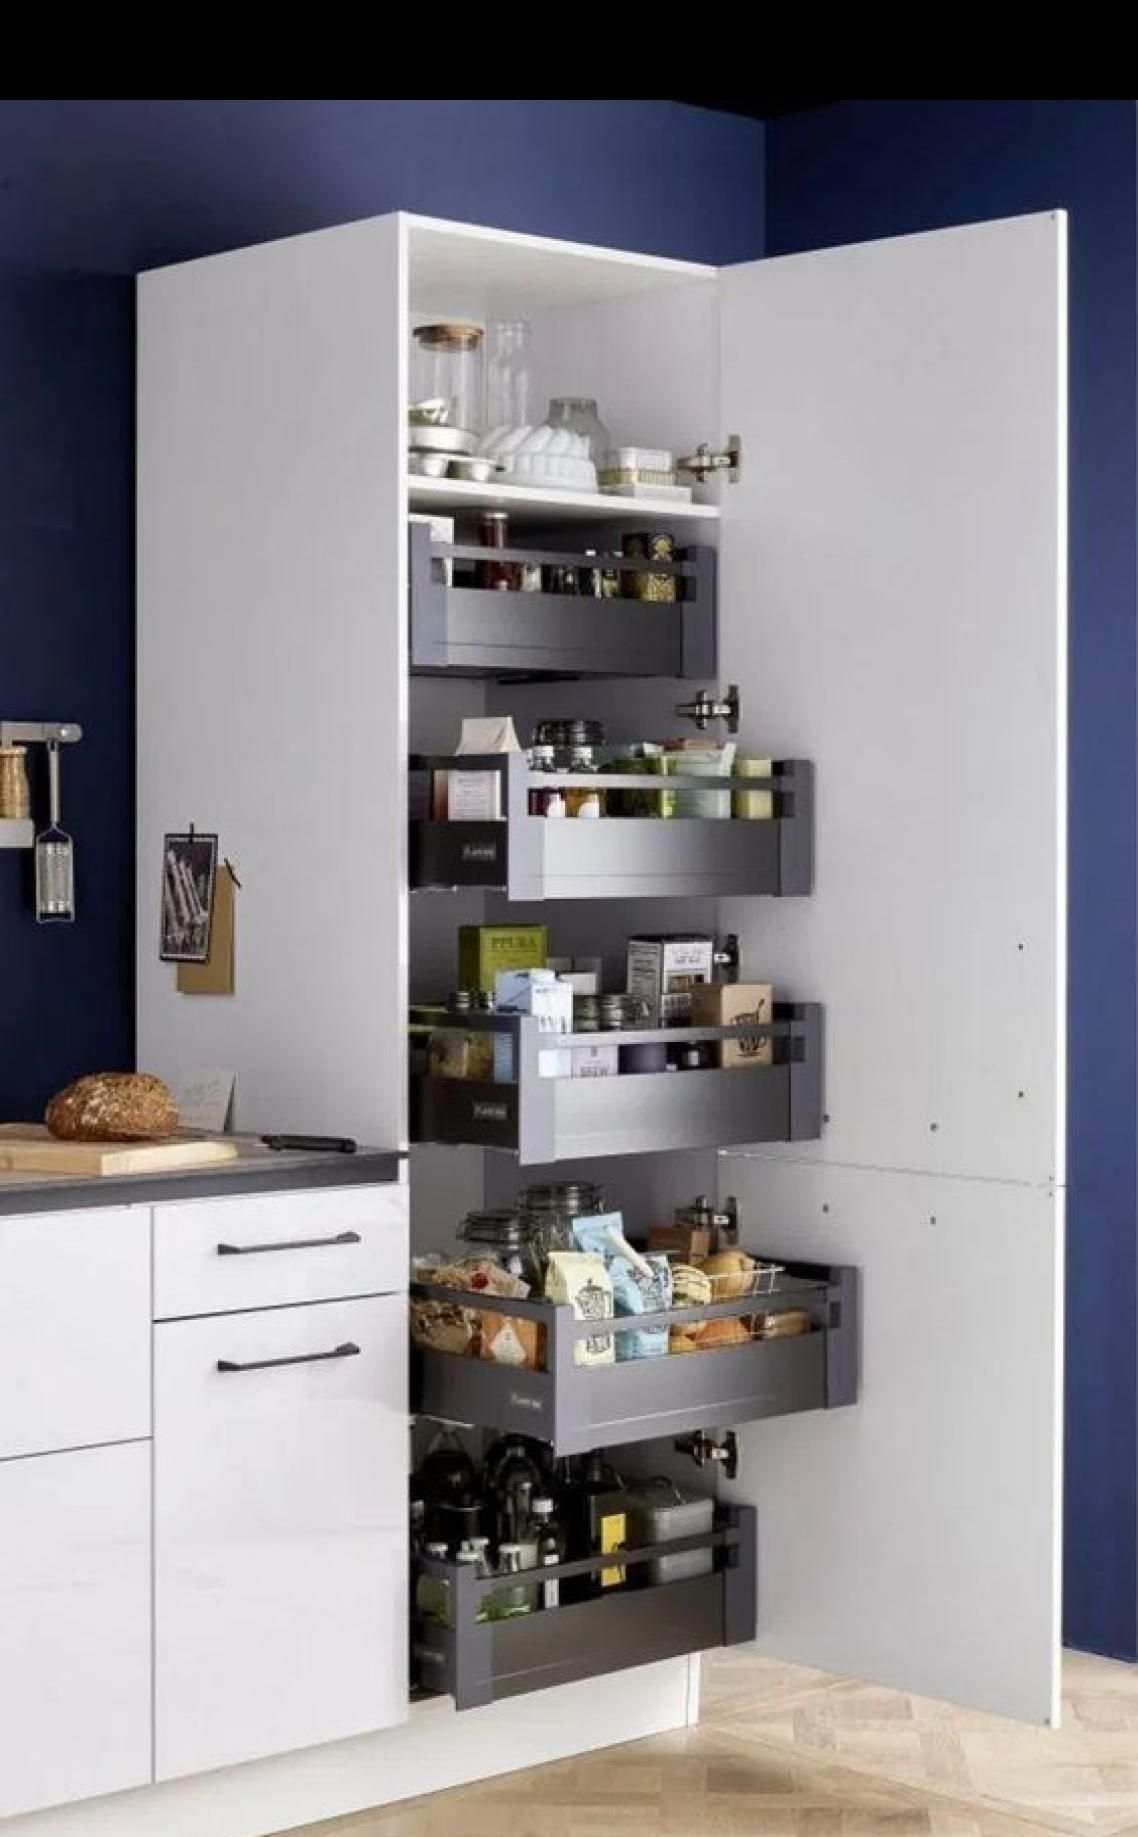 Otos Of 25 Beautiful Kitchens Kitchen Furniture Design Interior Design Kitchen Modern Kitchen Design